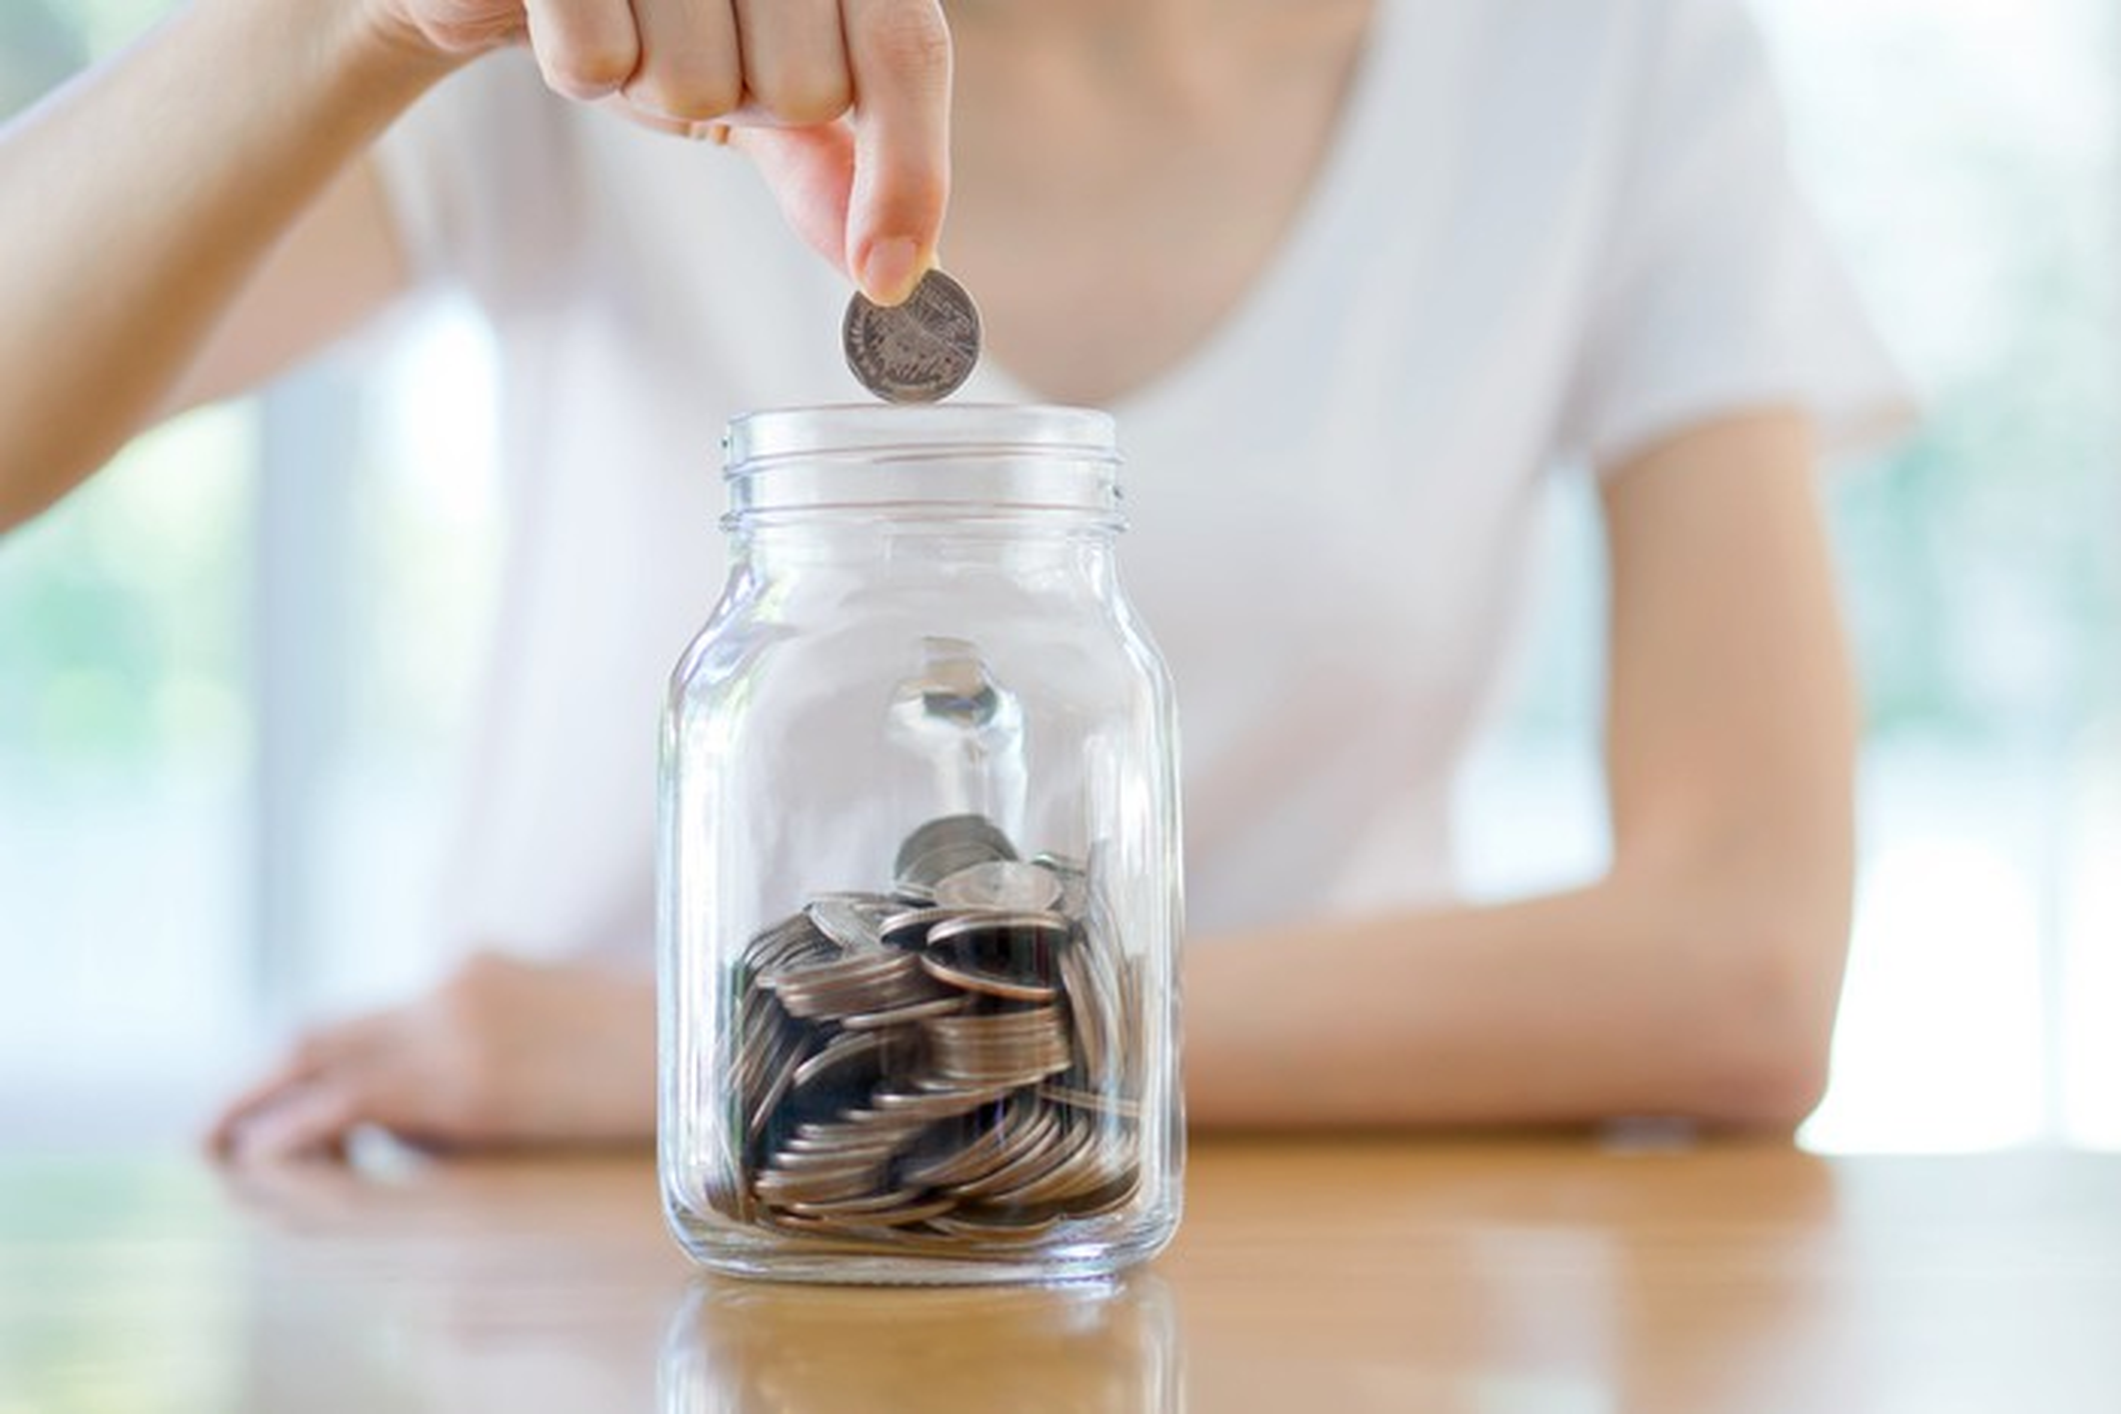 Woman dropping a coin into a savings jar.